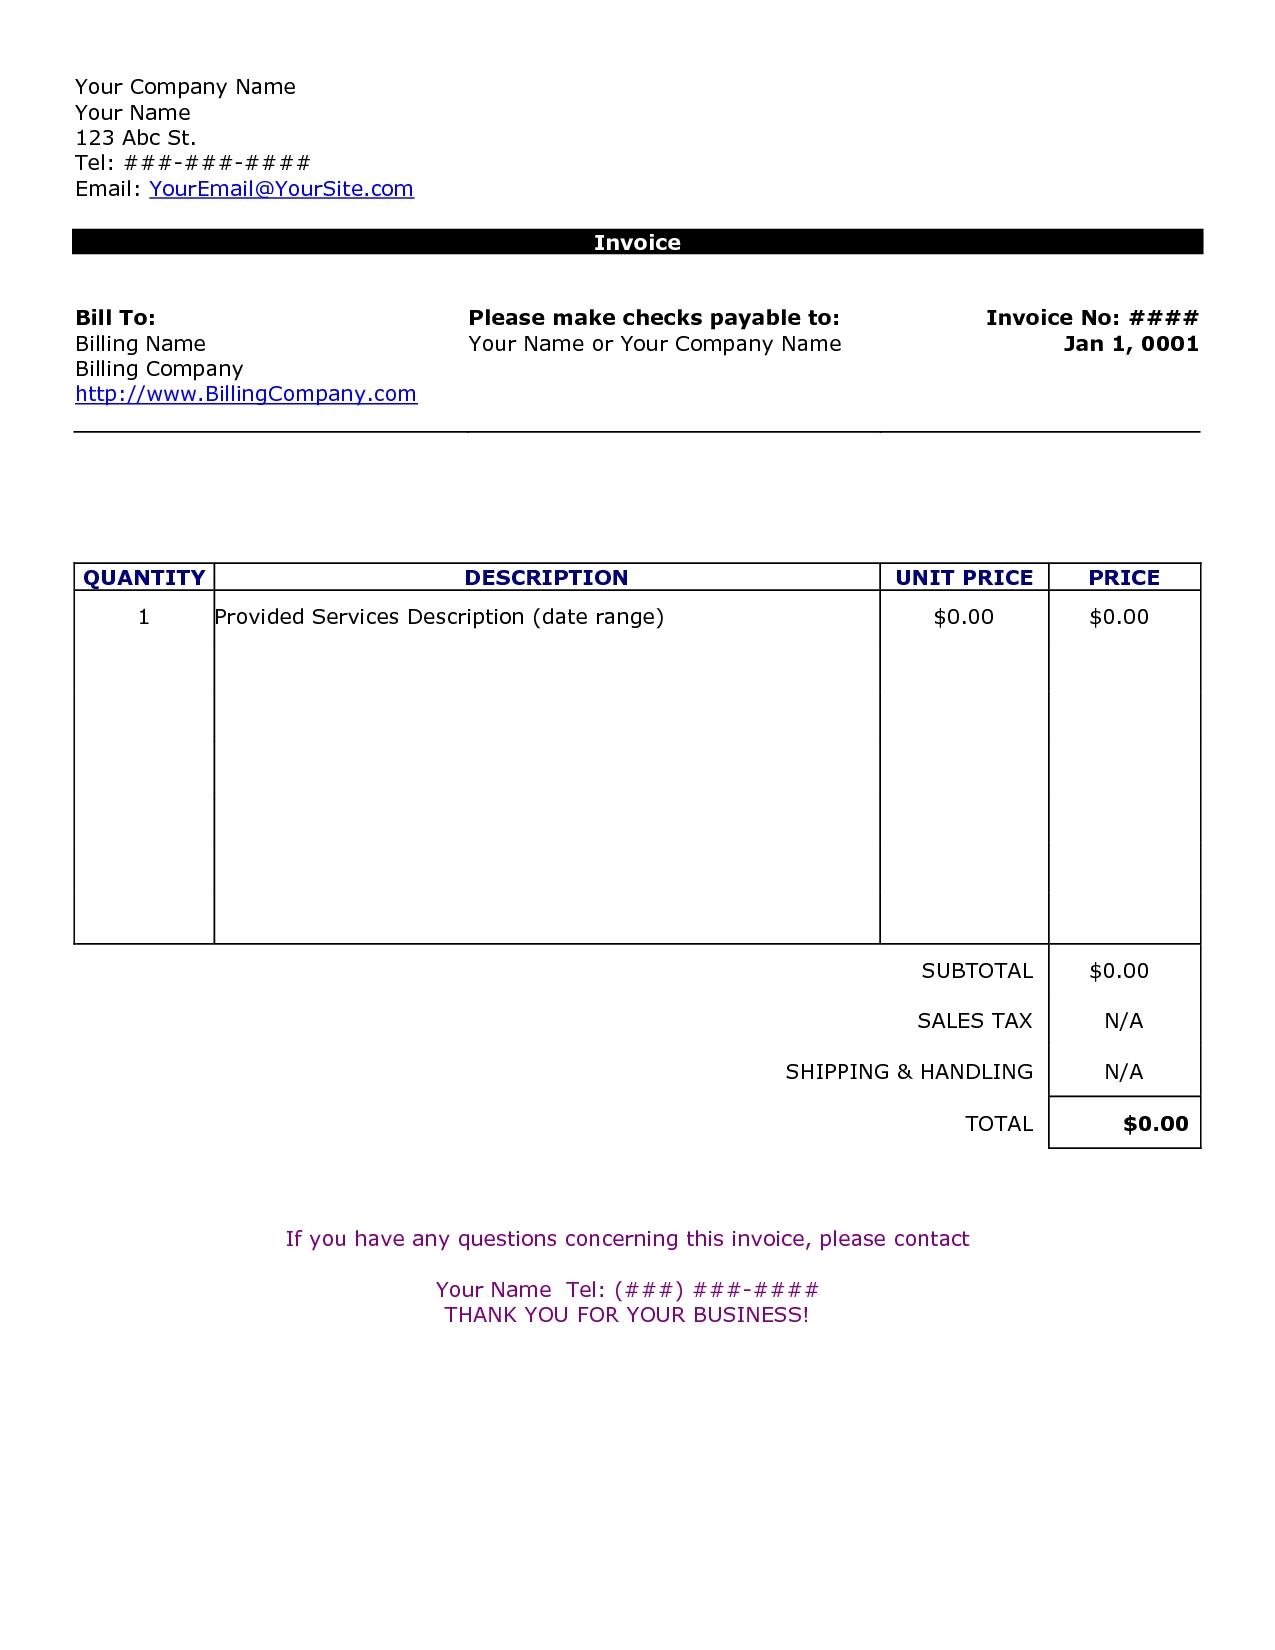 sample invoice template free company letterhead word template basic invoice template free